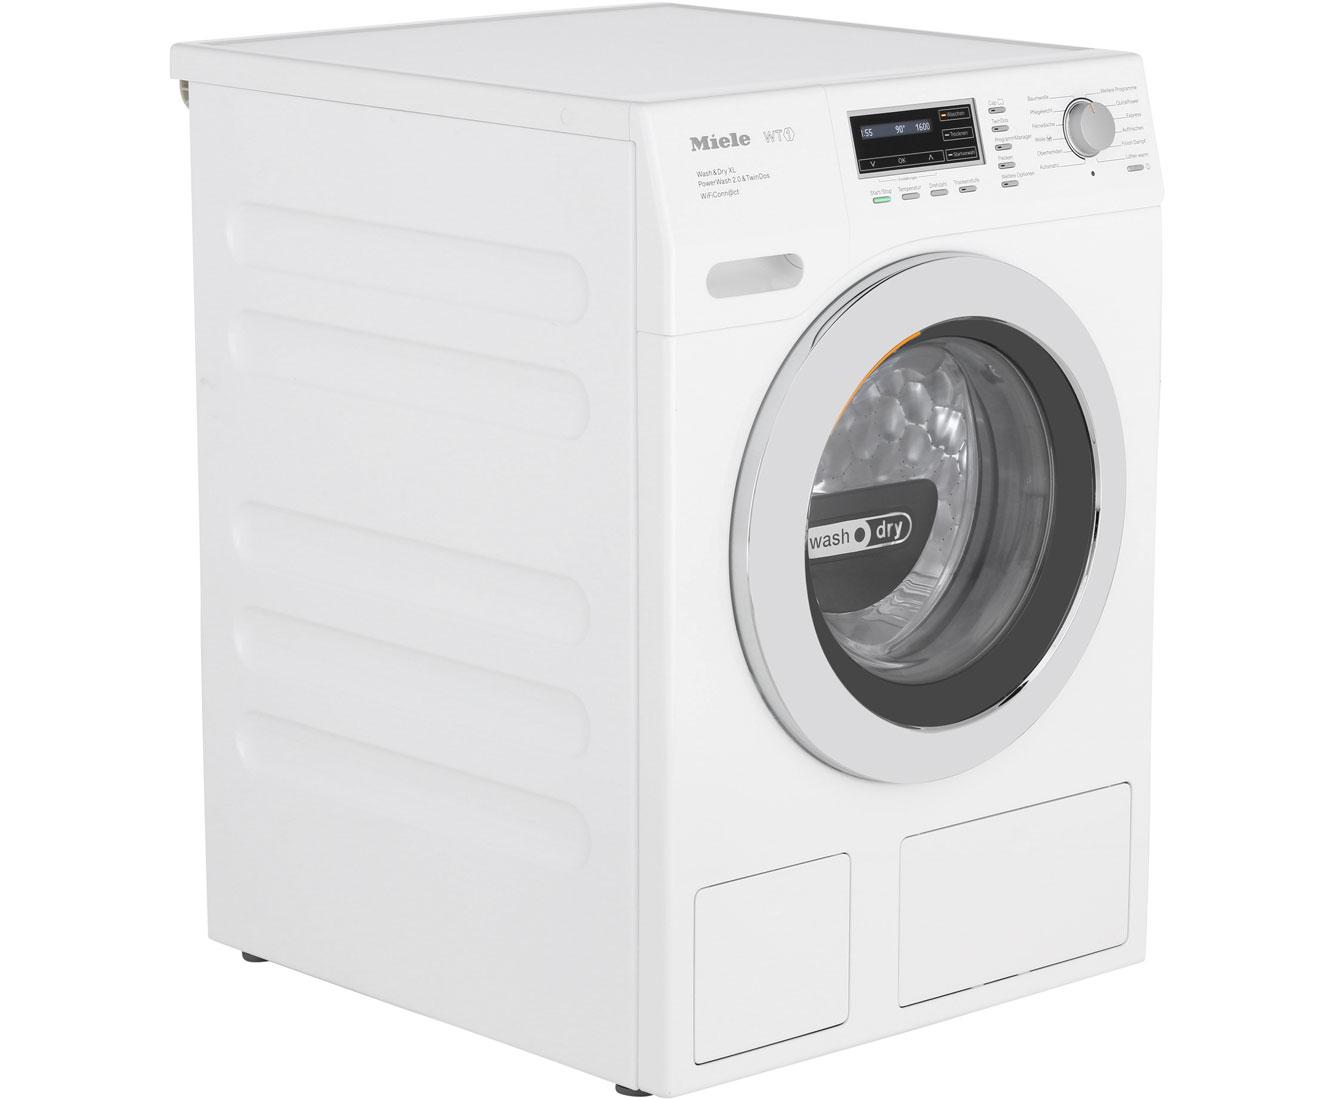 Miele wtzh wpm waschtrockner kg waschen kg trocknen